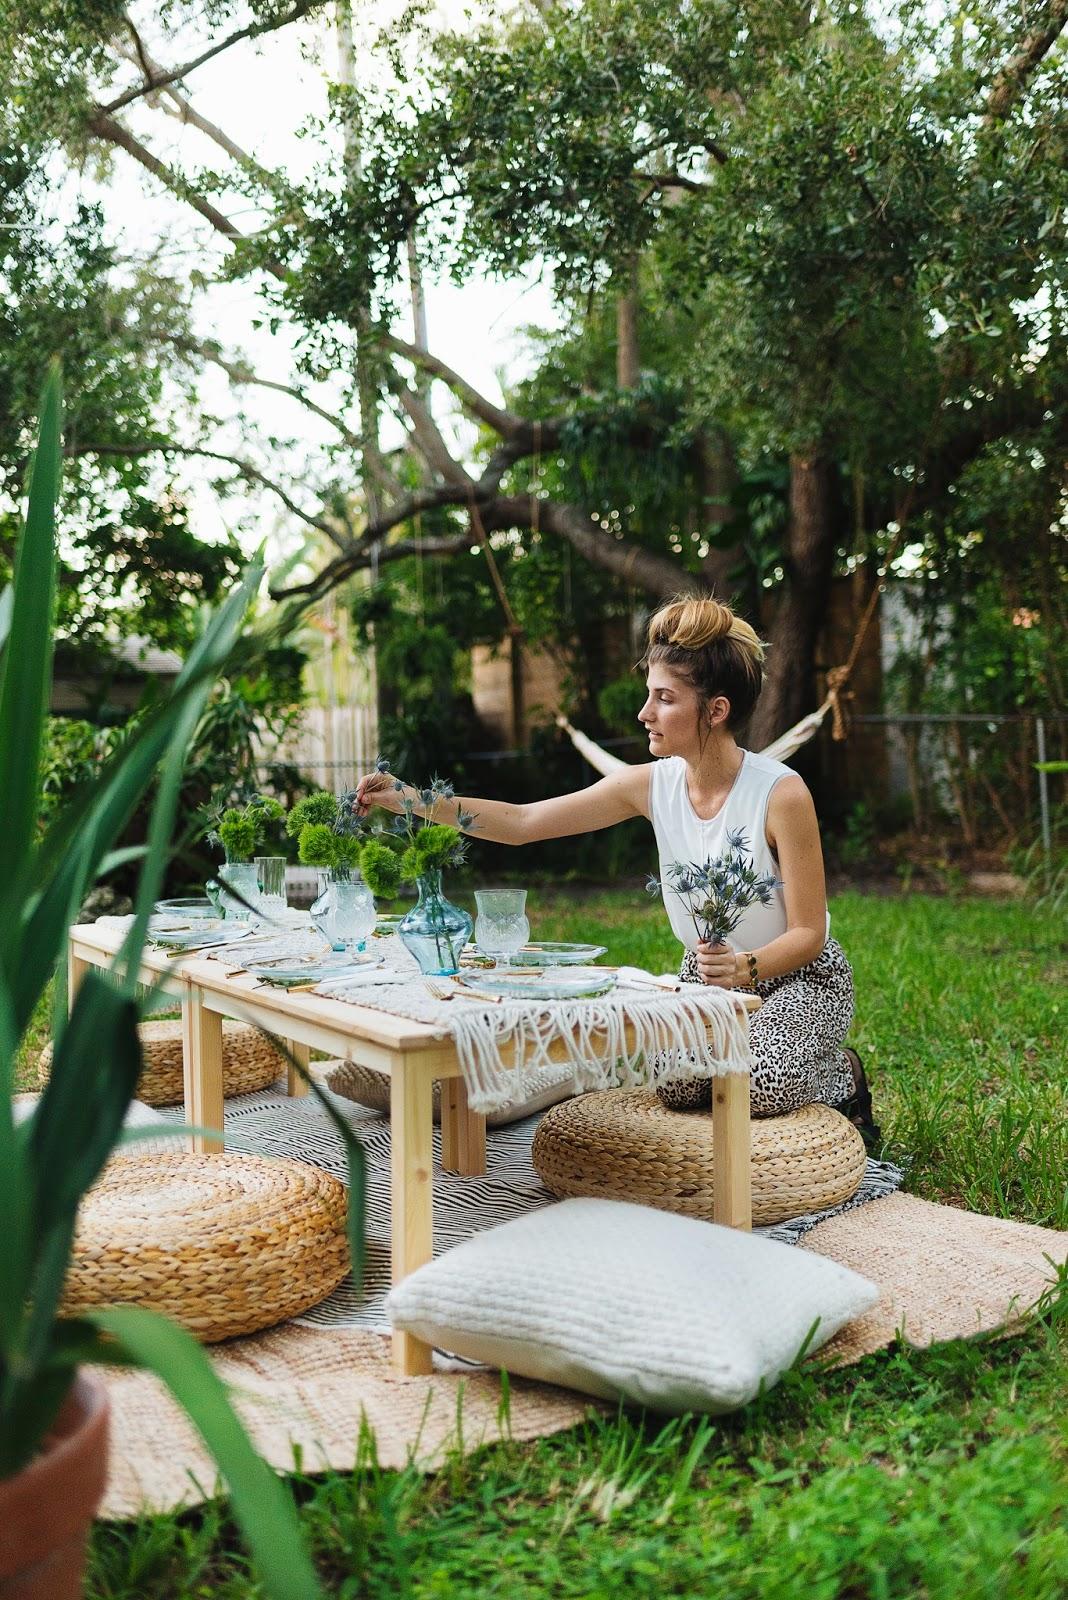 Ikea, Arte Boheme, Denise Lives